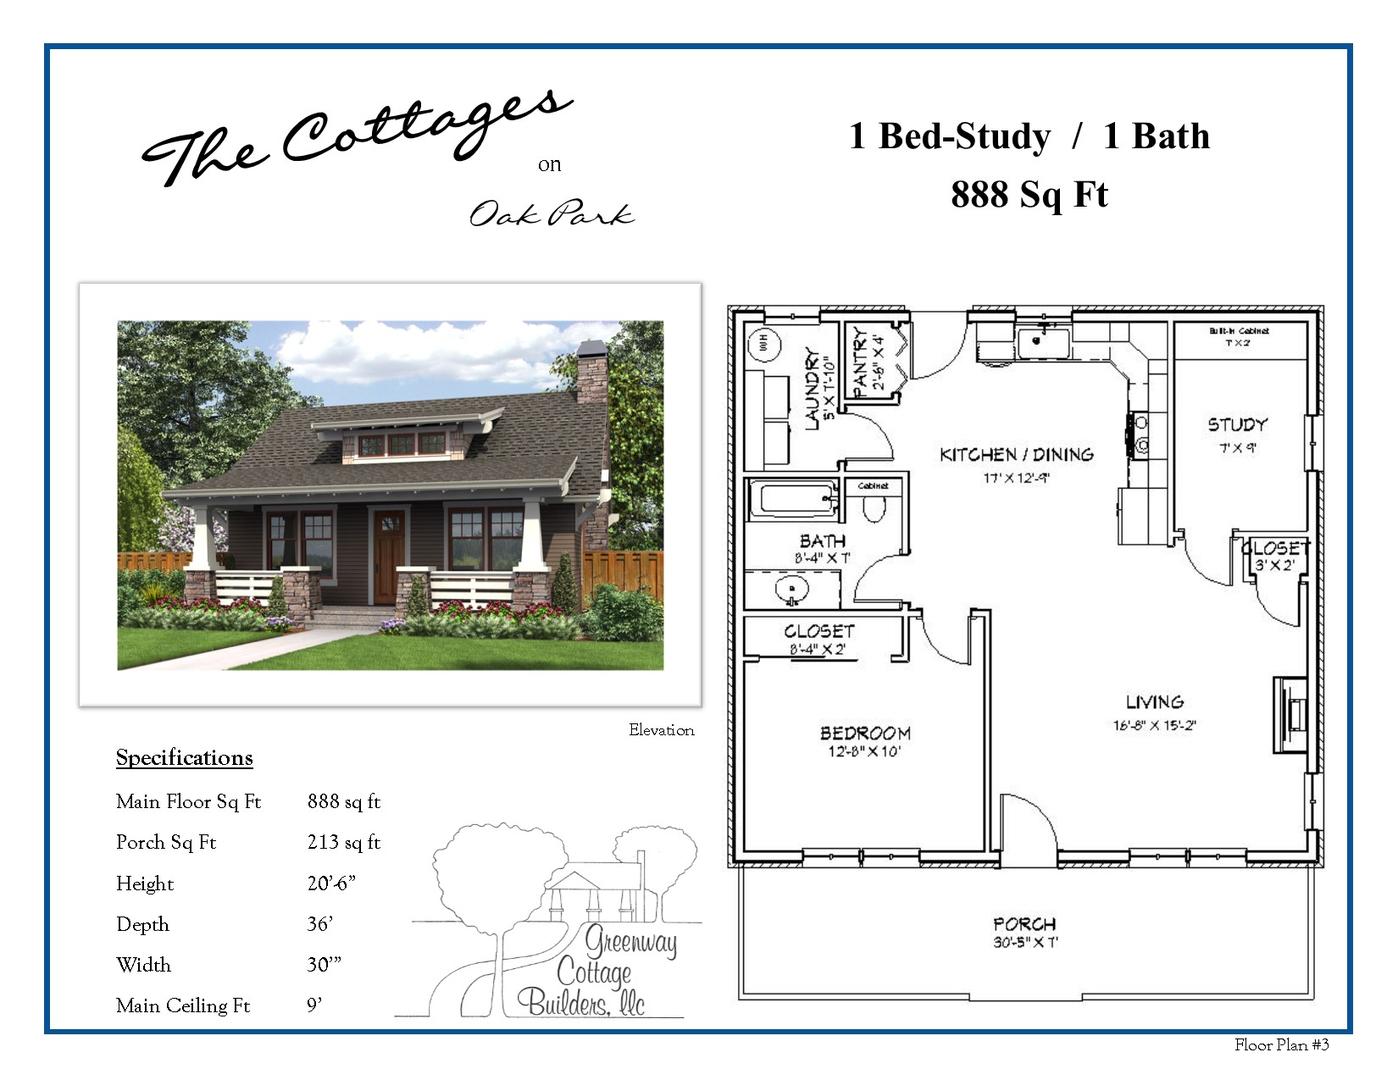 Floor Plans 1 & 2 Bedroom Cottages